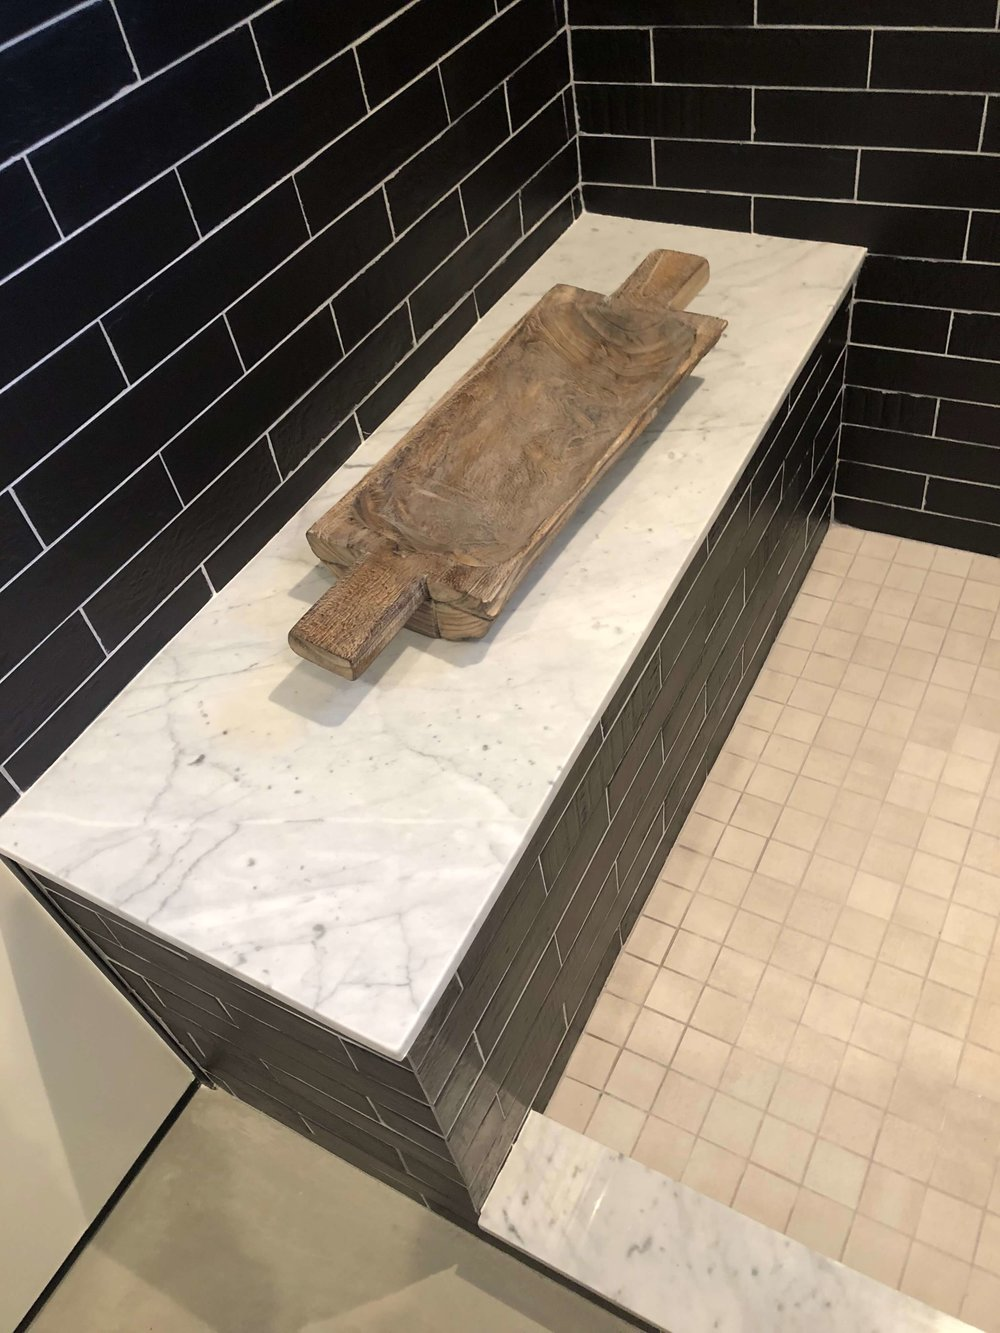 Shower bench in California contemporary home, Dwell on Design's Fall Home Tour, Designer: Vitus Matare #showerbench #blacktile #bathroomdesignideas